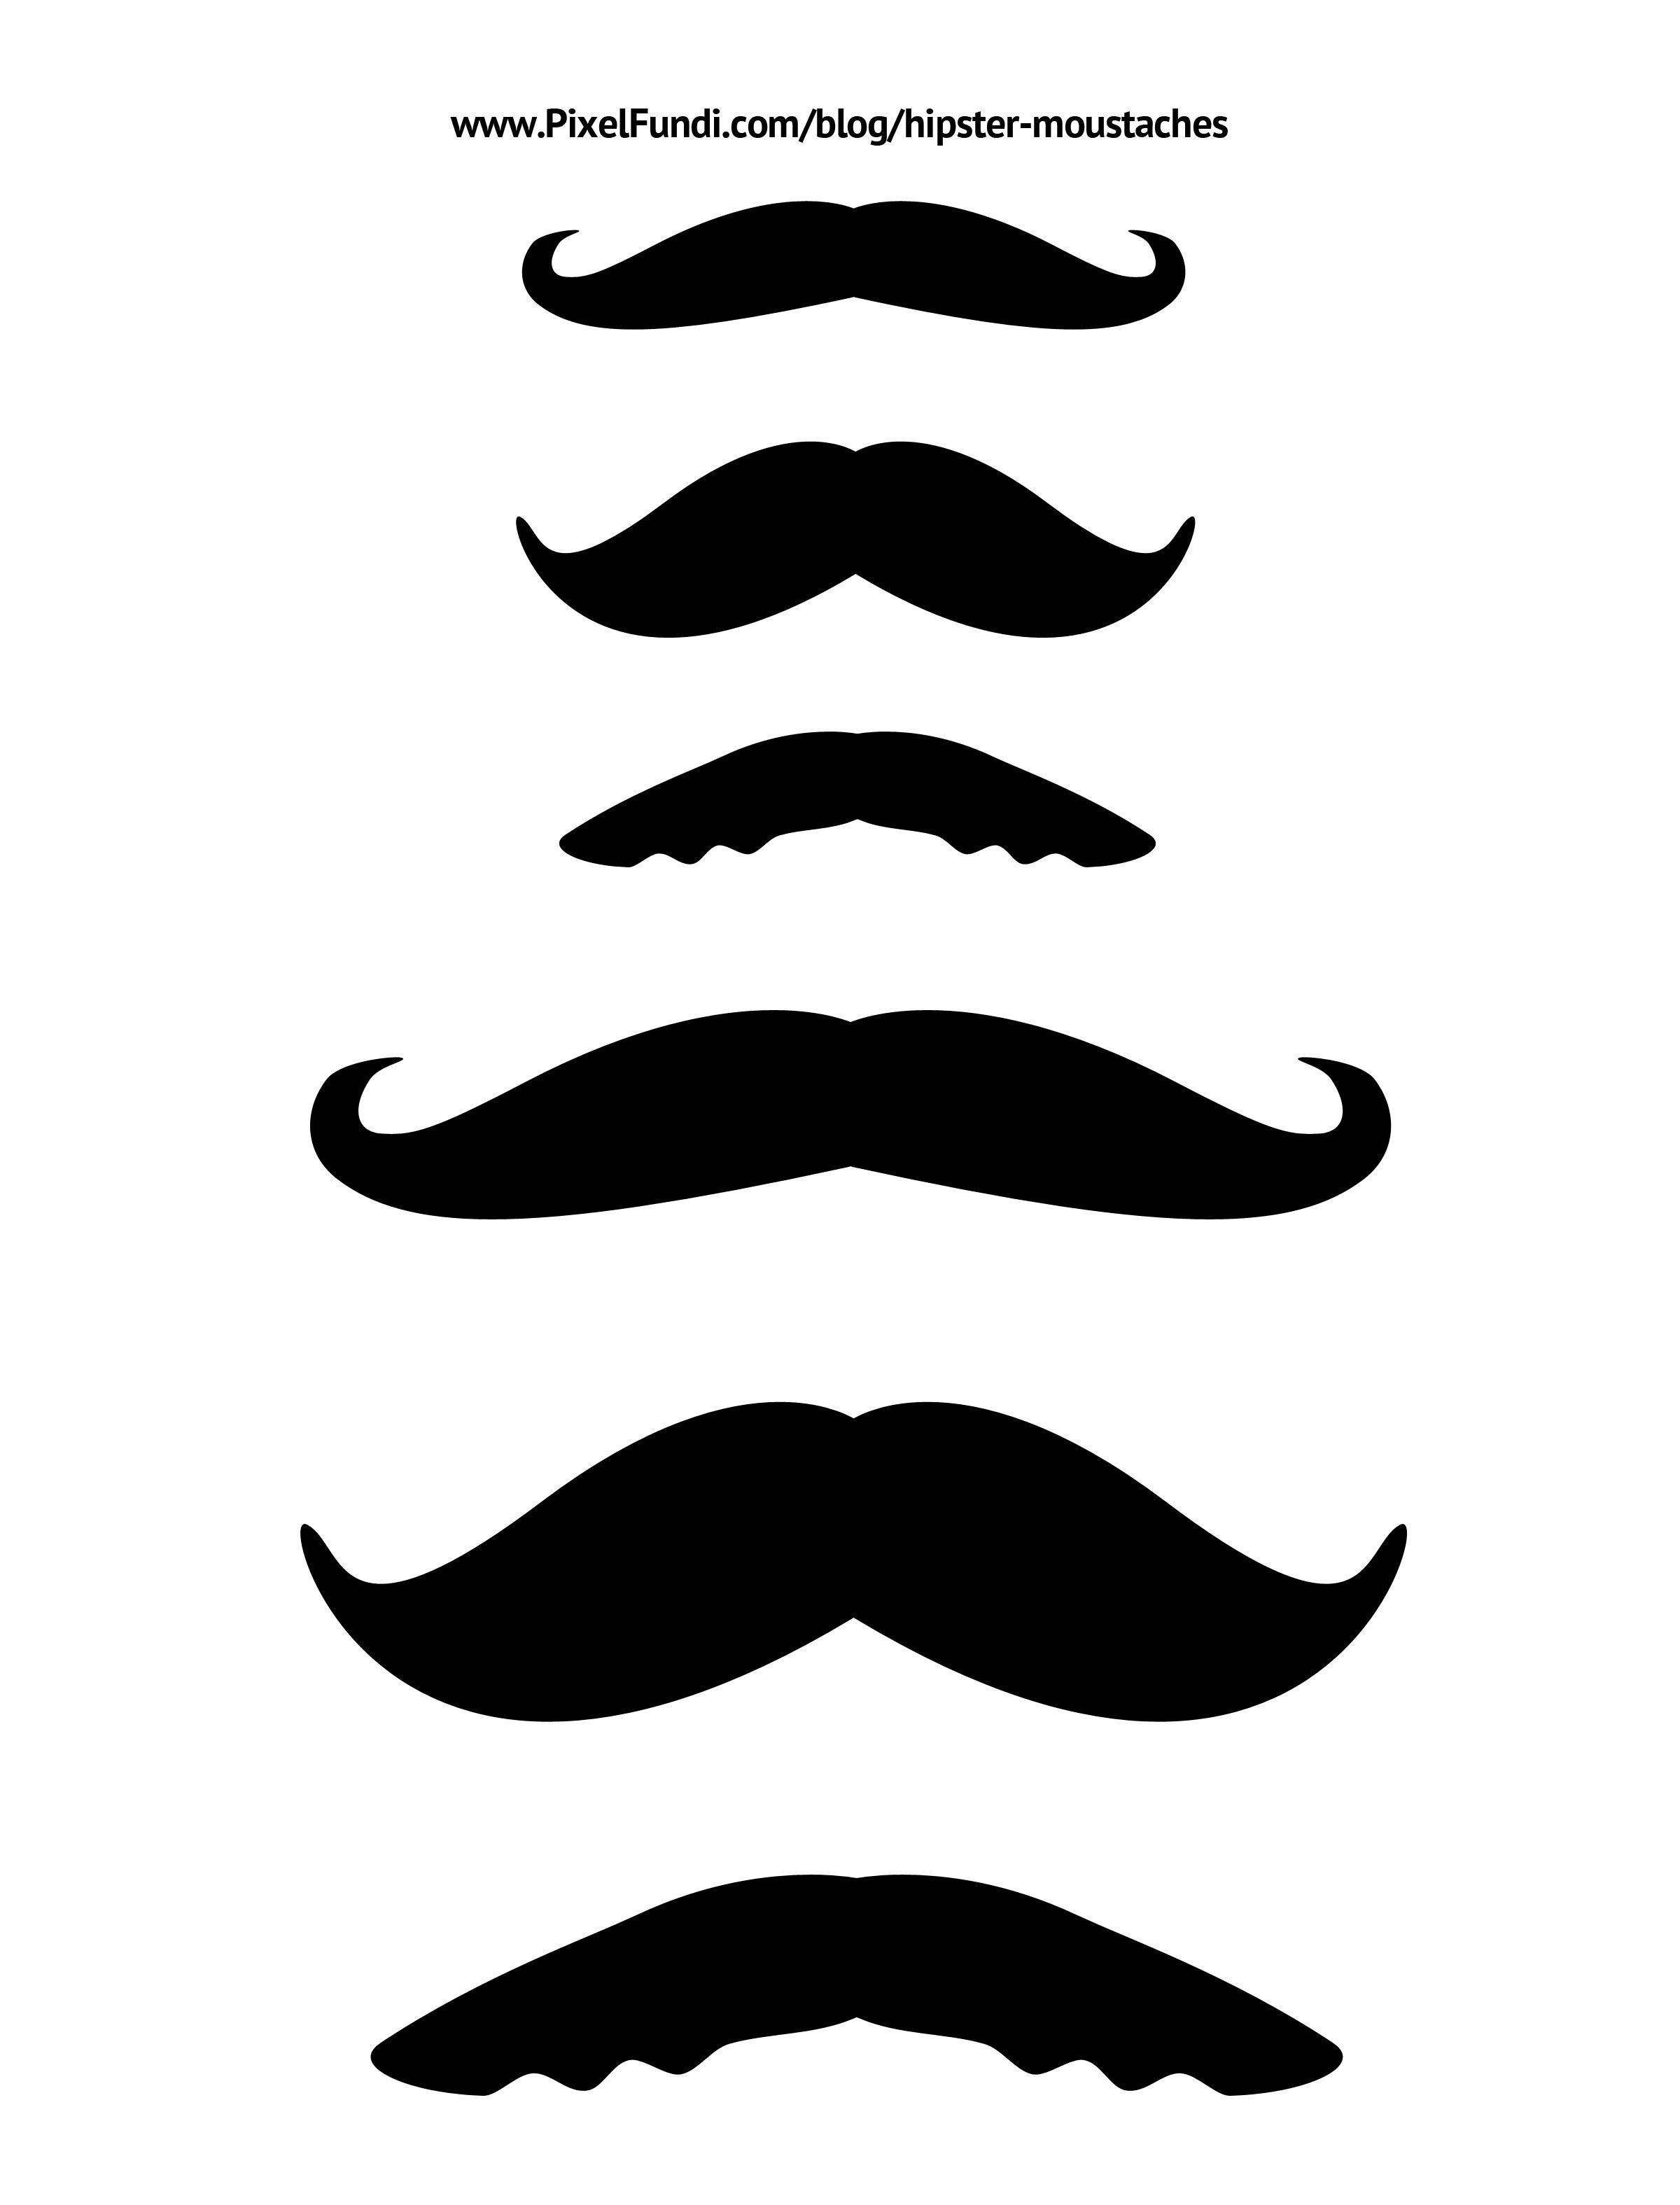 Http://www.clipartbest.com/large-mustache-template - ClipArt Best ...